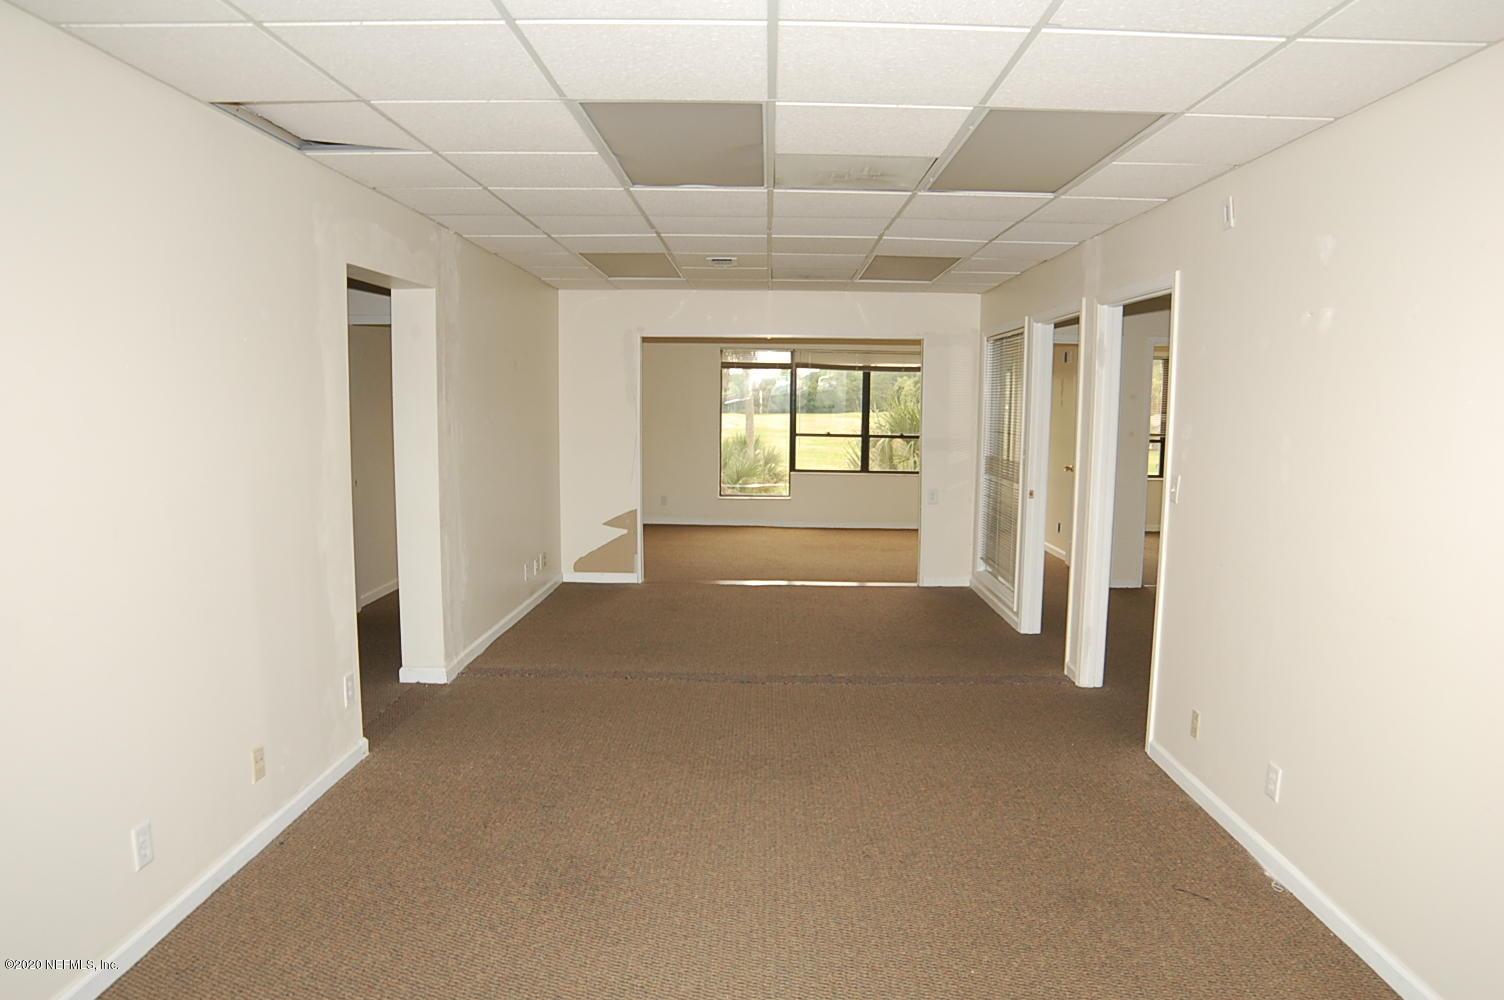 8130 BAYMEADOWS, JACKSONVILLE, FLORIDA 32256, ,Commercial,For sale,BAYMEADOWS,1081176